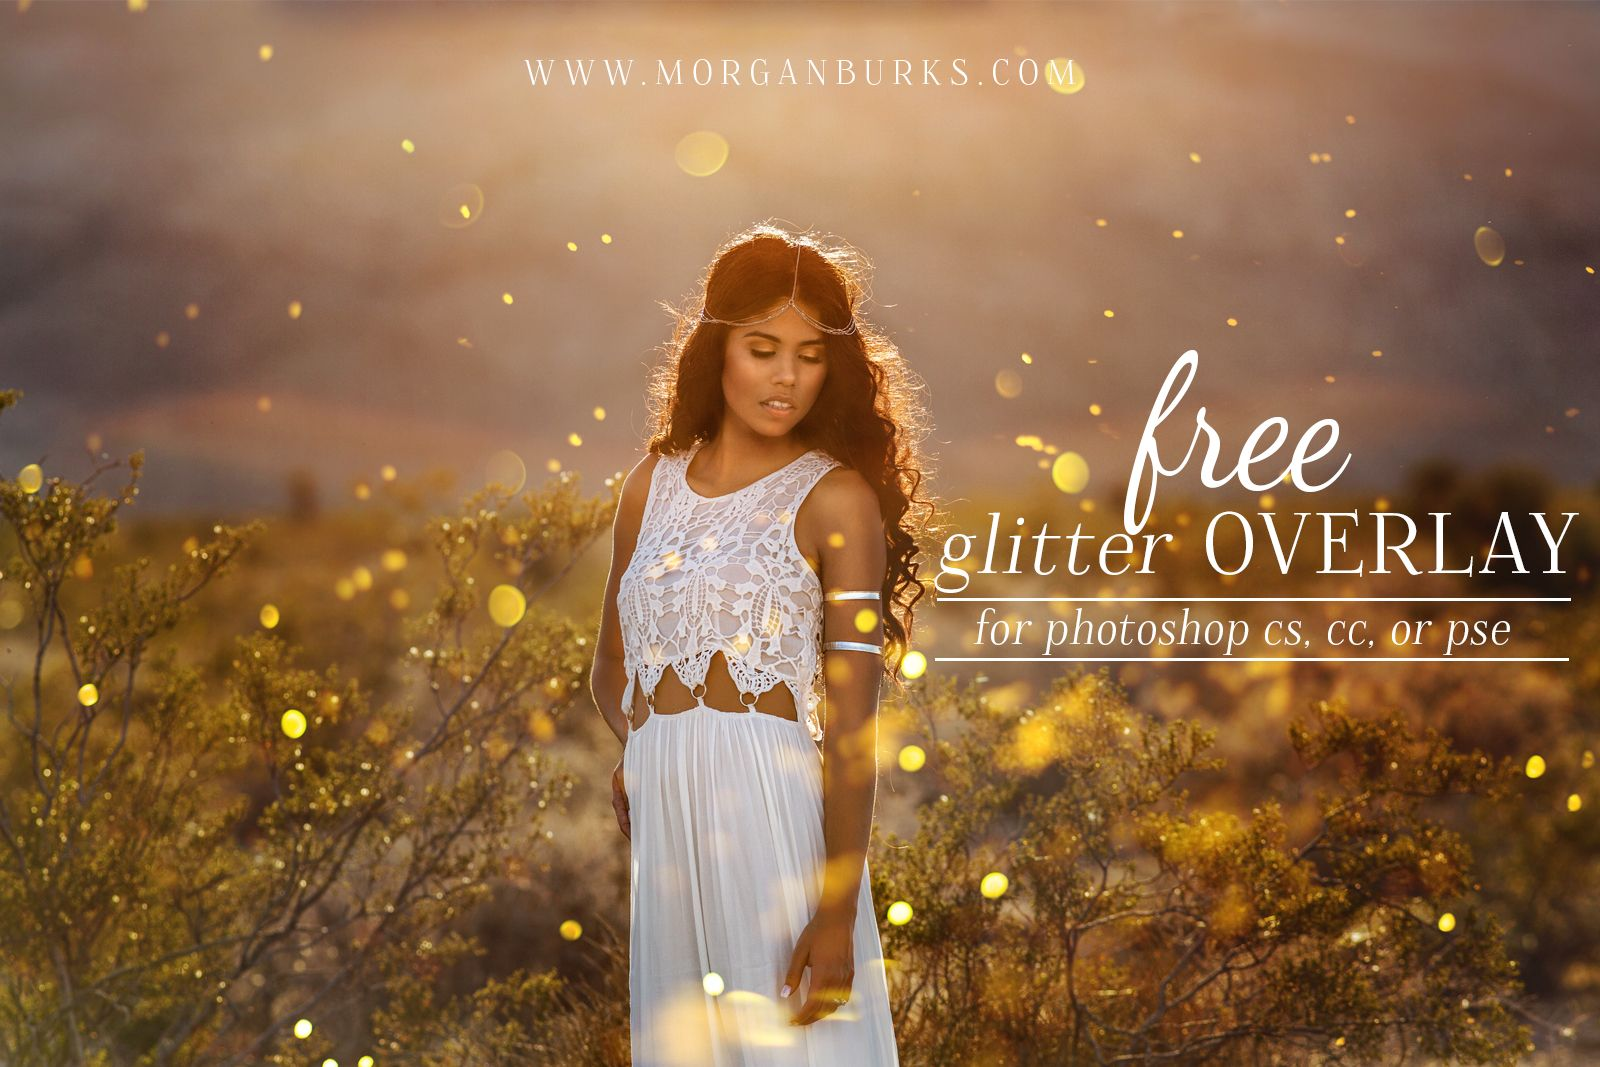 Free Glitter Overlay for Photoshop CS, PS CC, & PSE | Photo